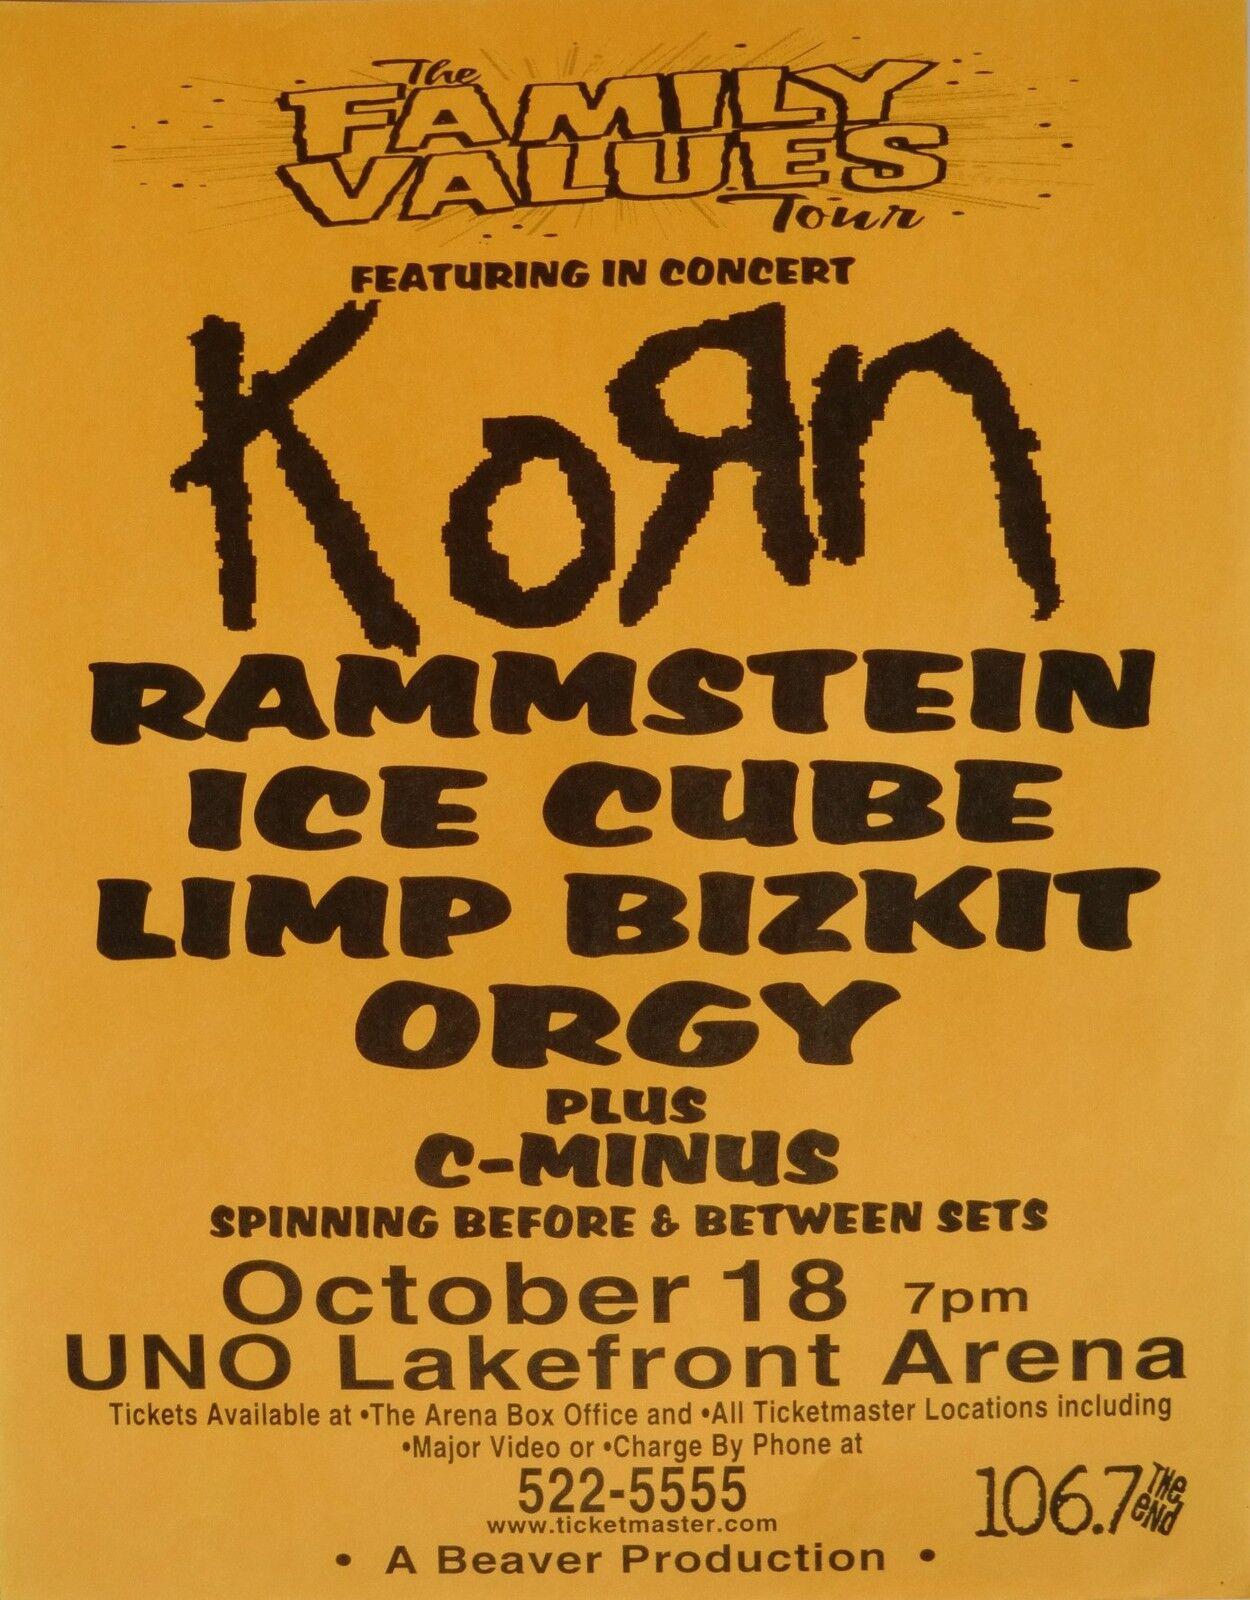 korn rammstein ice cube limp bizkit 2006 new orleans concert tour poster ebay. Black Bedroom Furniture Sets. Home Design Ideas